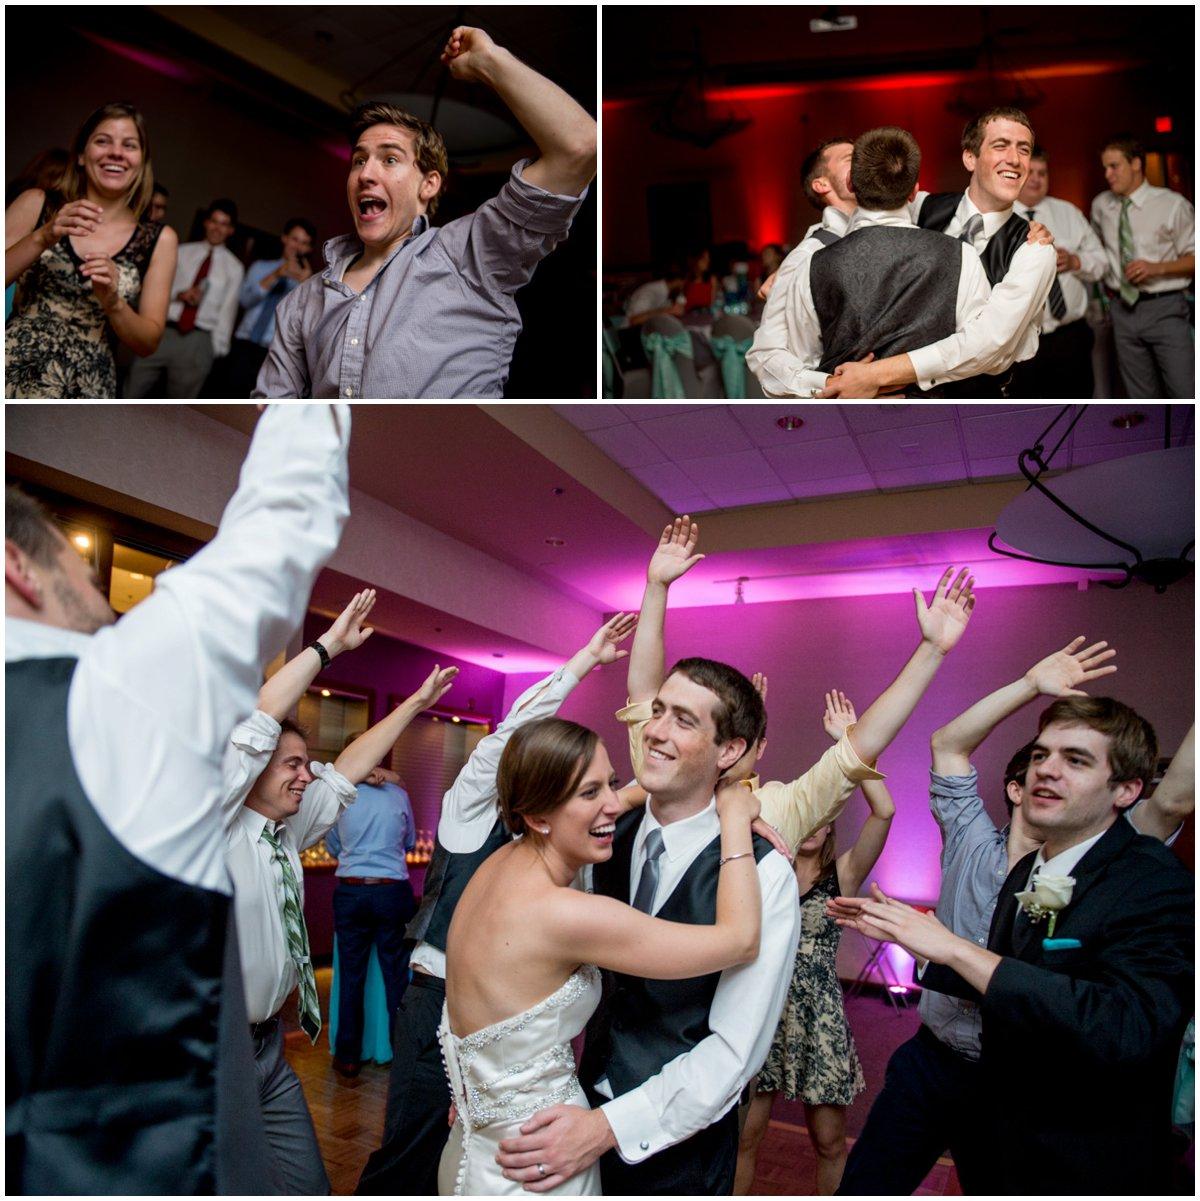 Mavris-wedding-pictures-Nate-Crouch-025.jpg